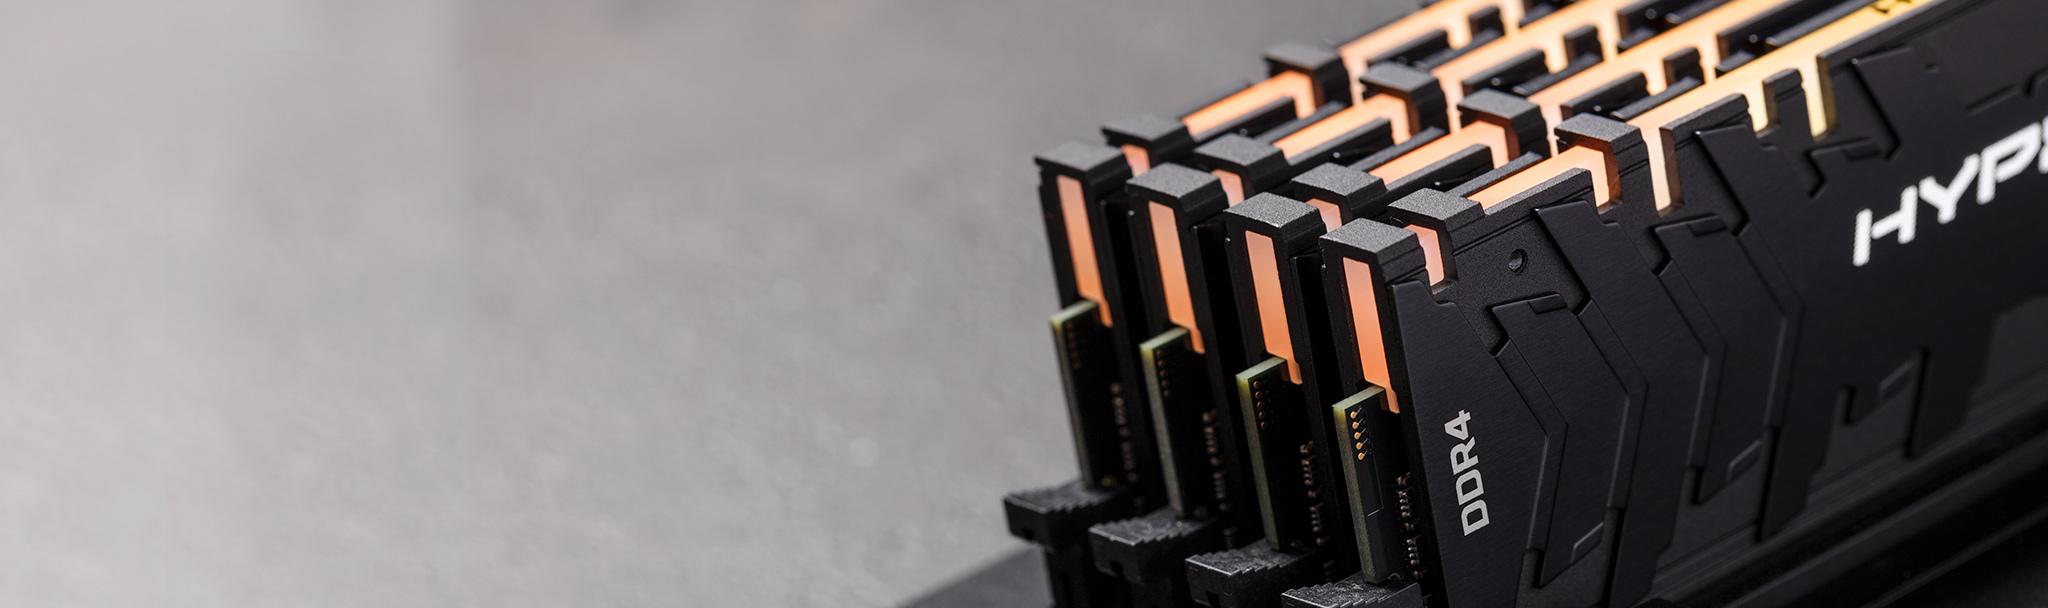 Fierce black aluminum heat spreader